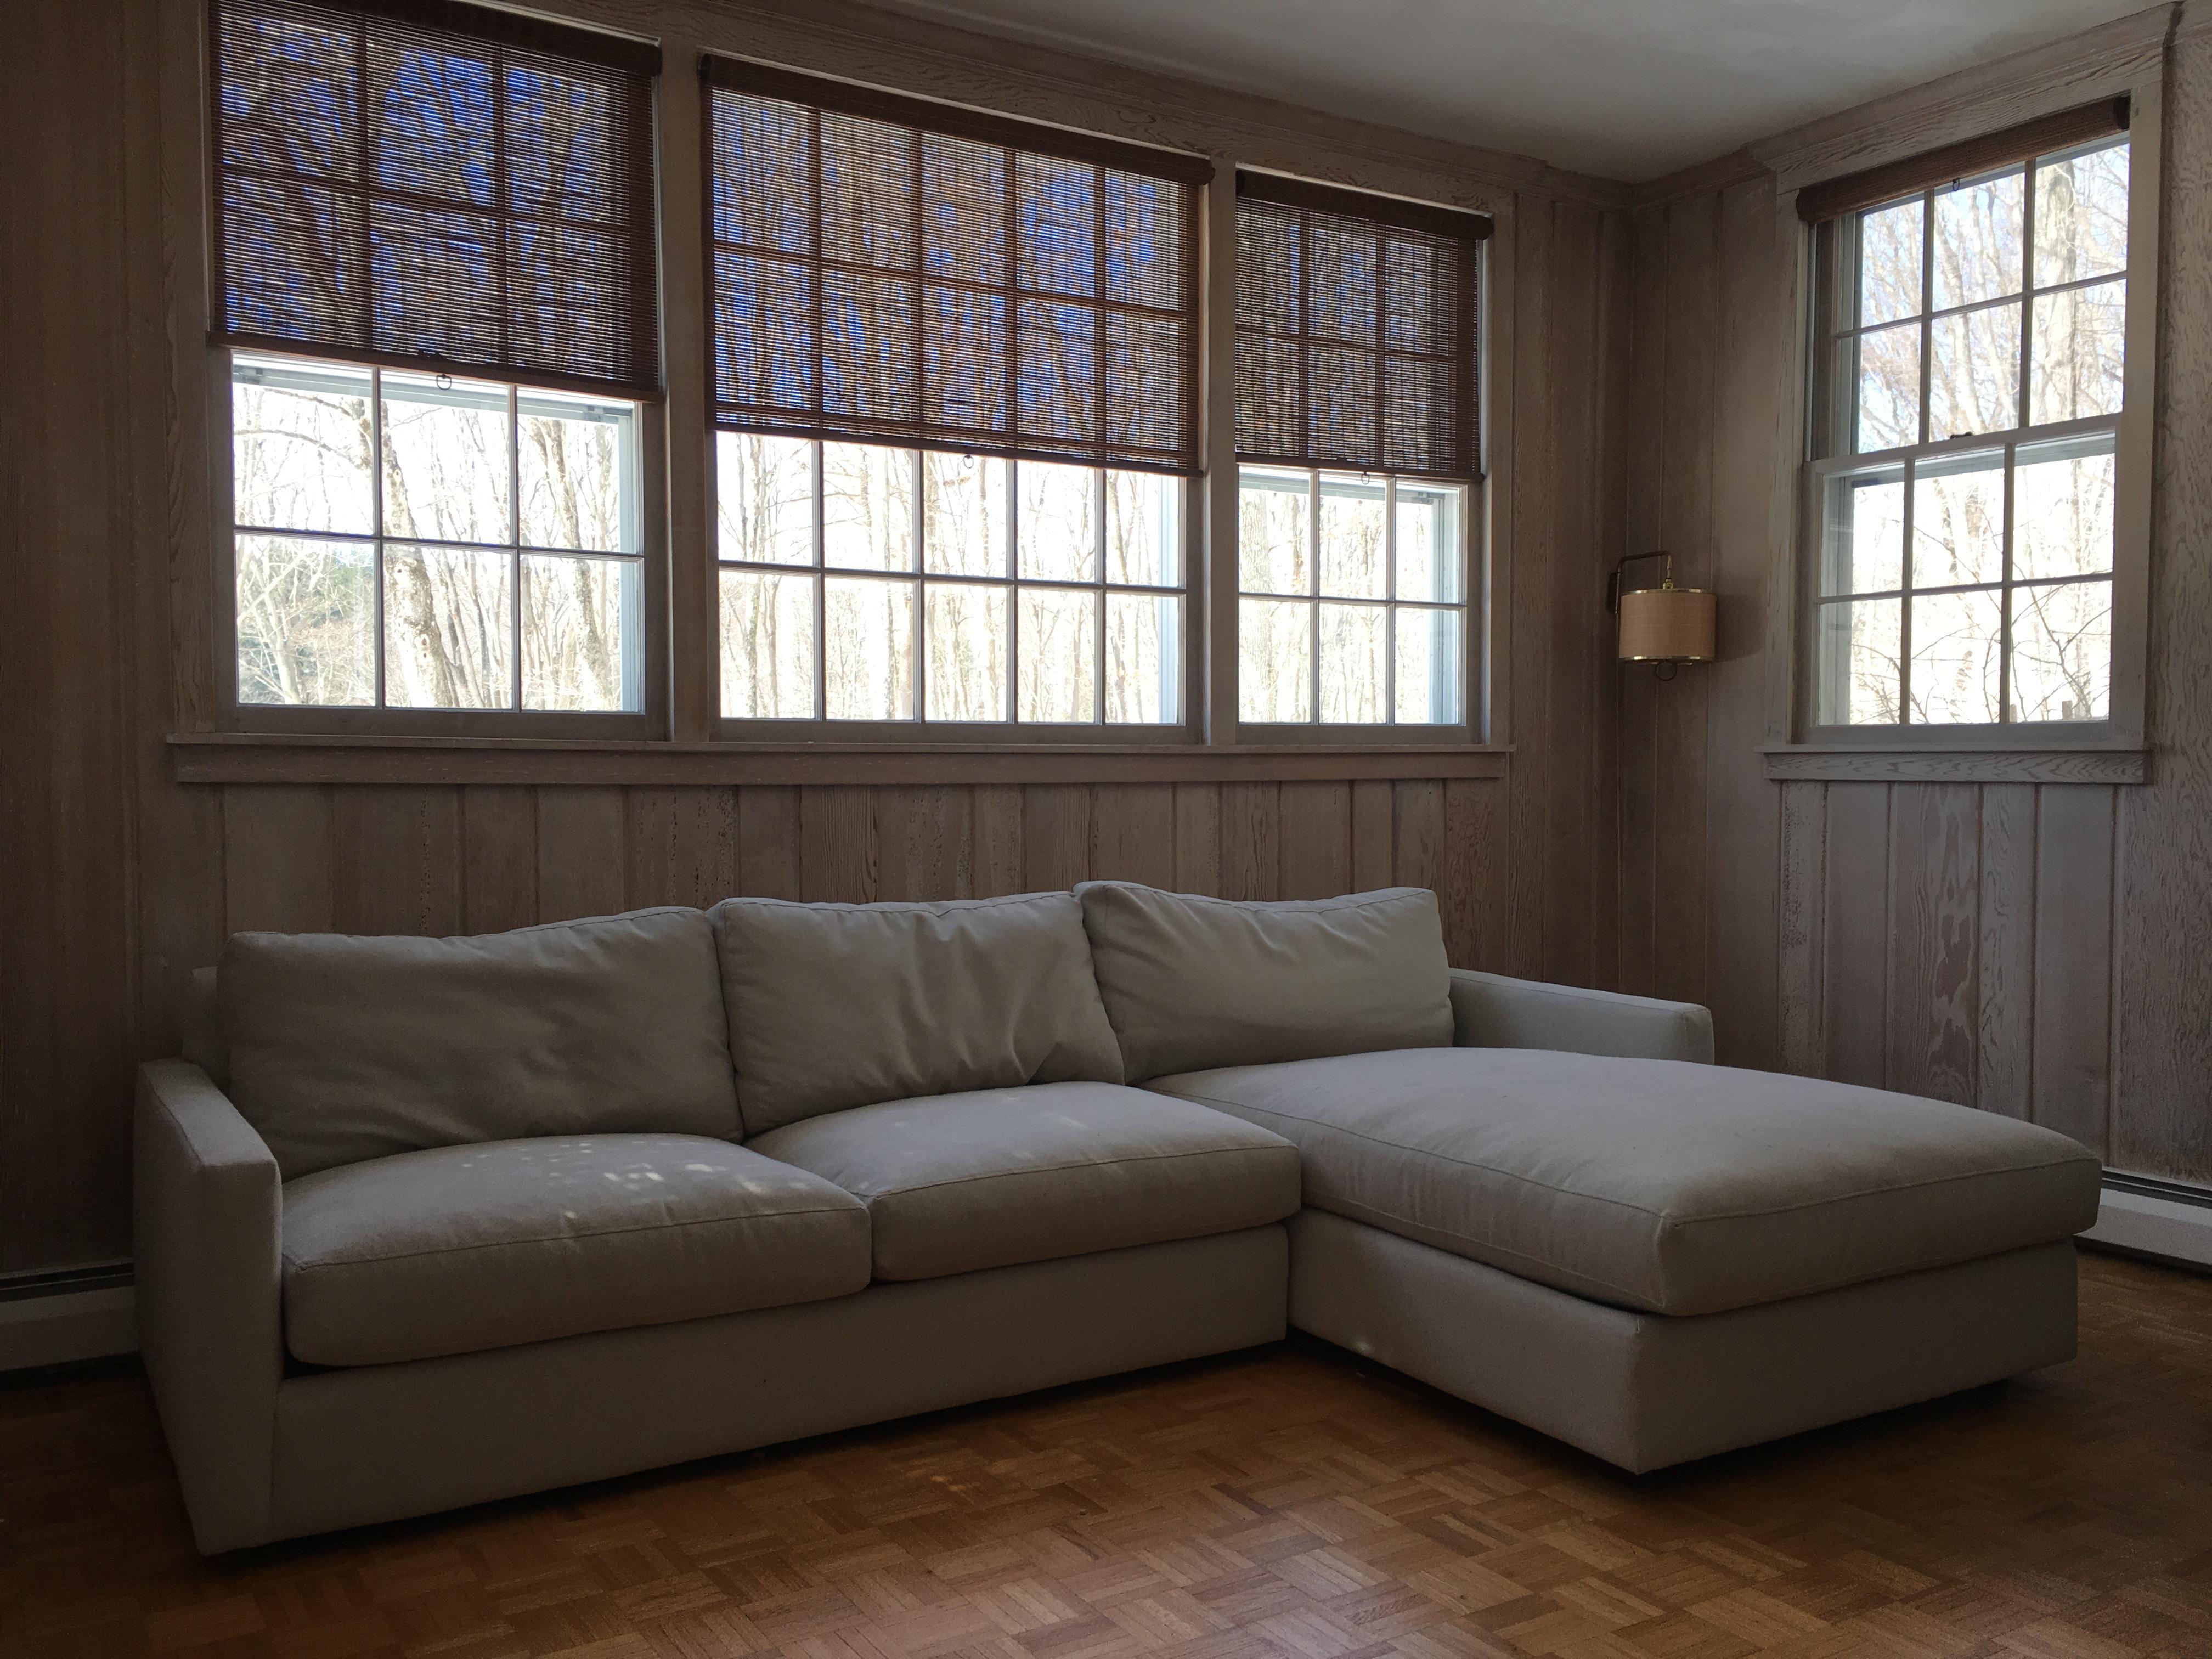 Room U0026 Board Easton Sofa   Image 4 ...